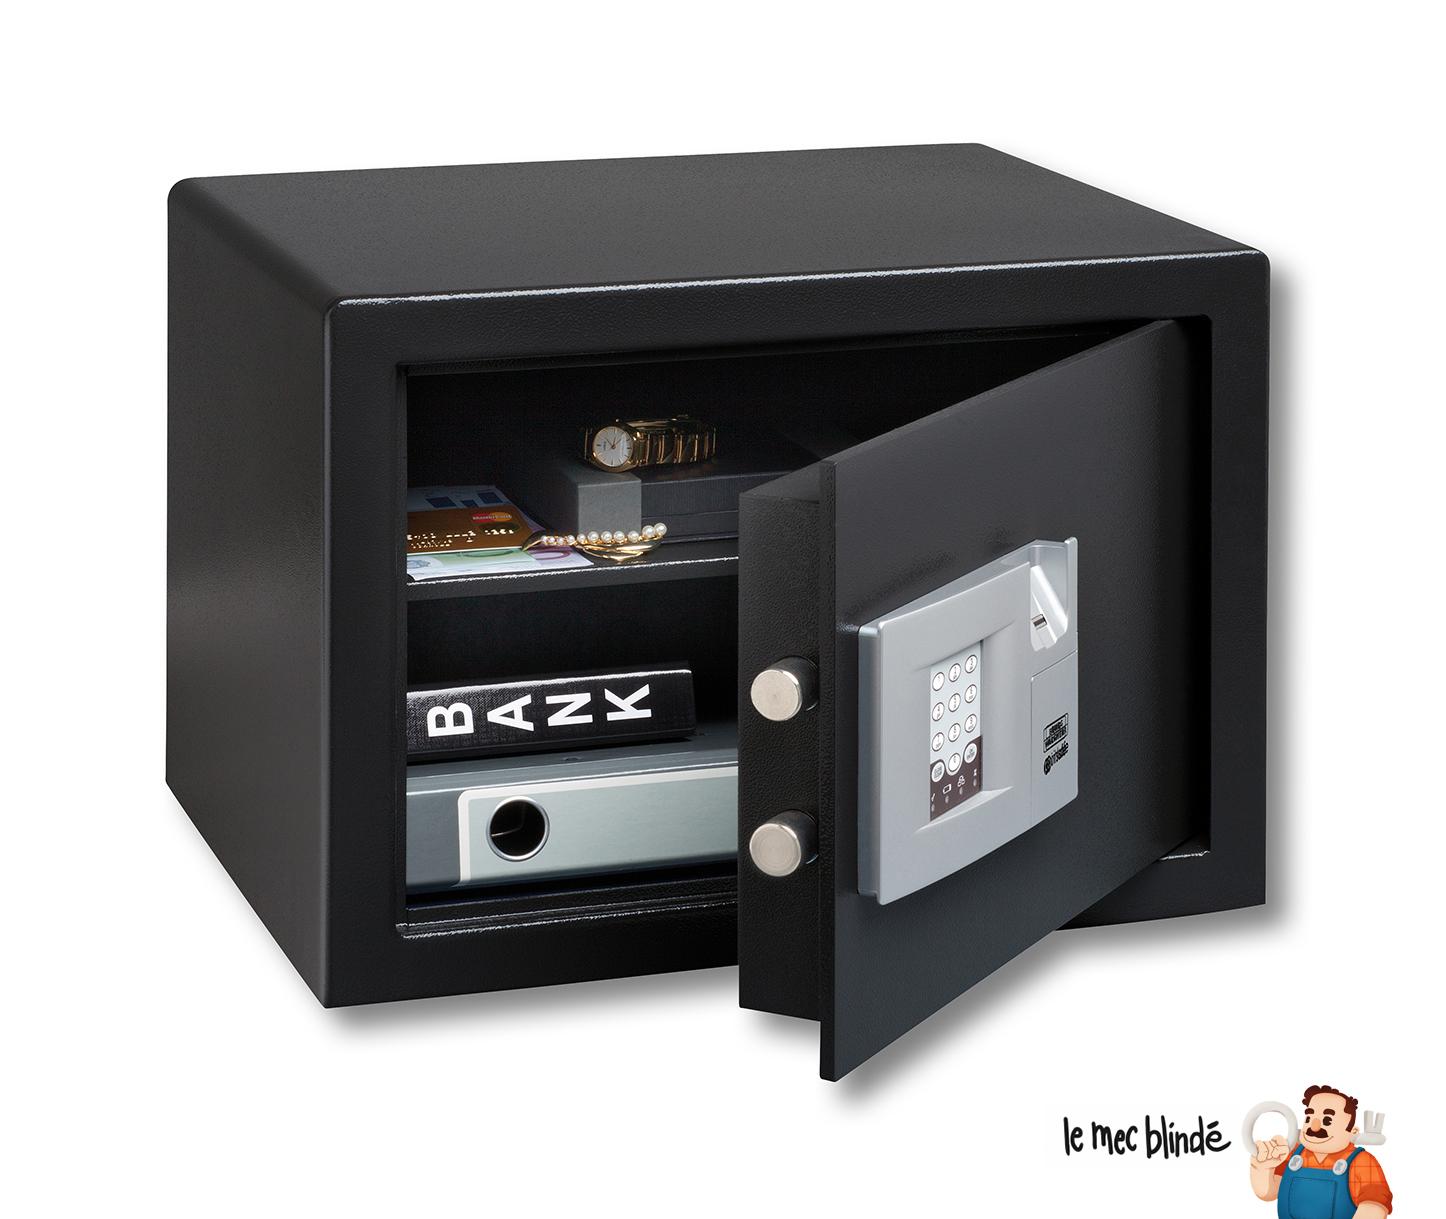 coffre fort h tel burg w chter p3e serrure electronique 38 l le mec blind. Black Bedroom Furniture Sets. Home Design Ideas